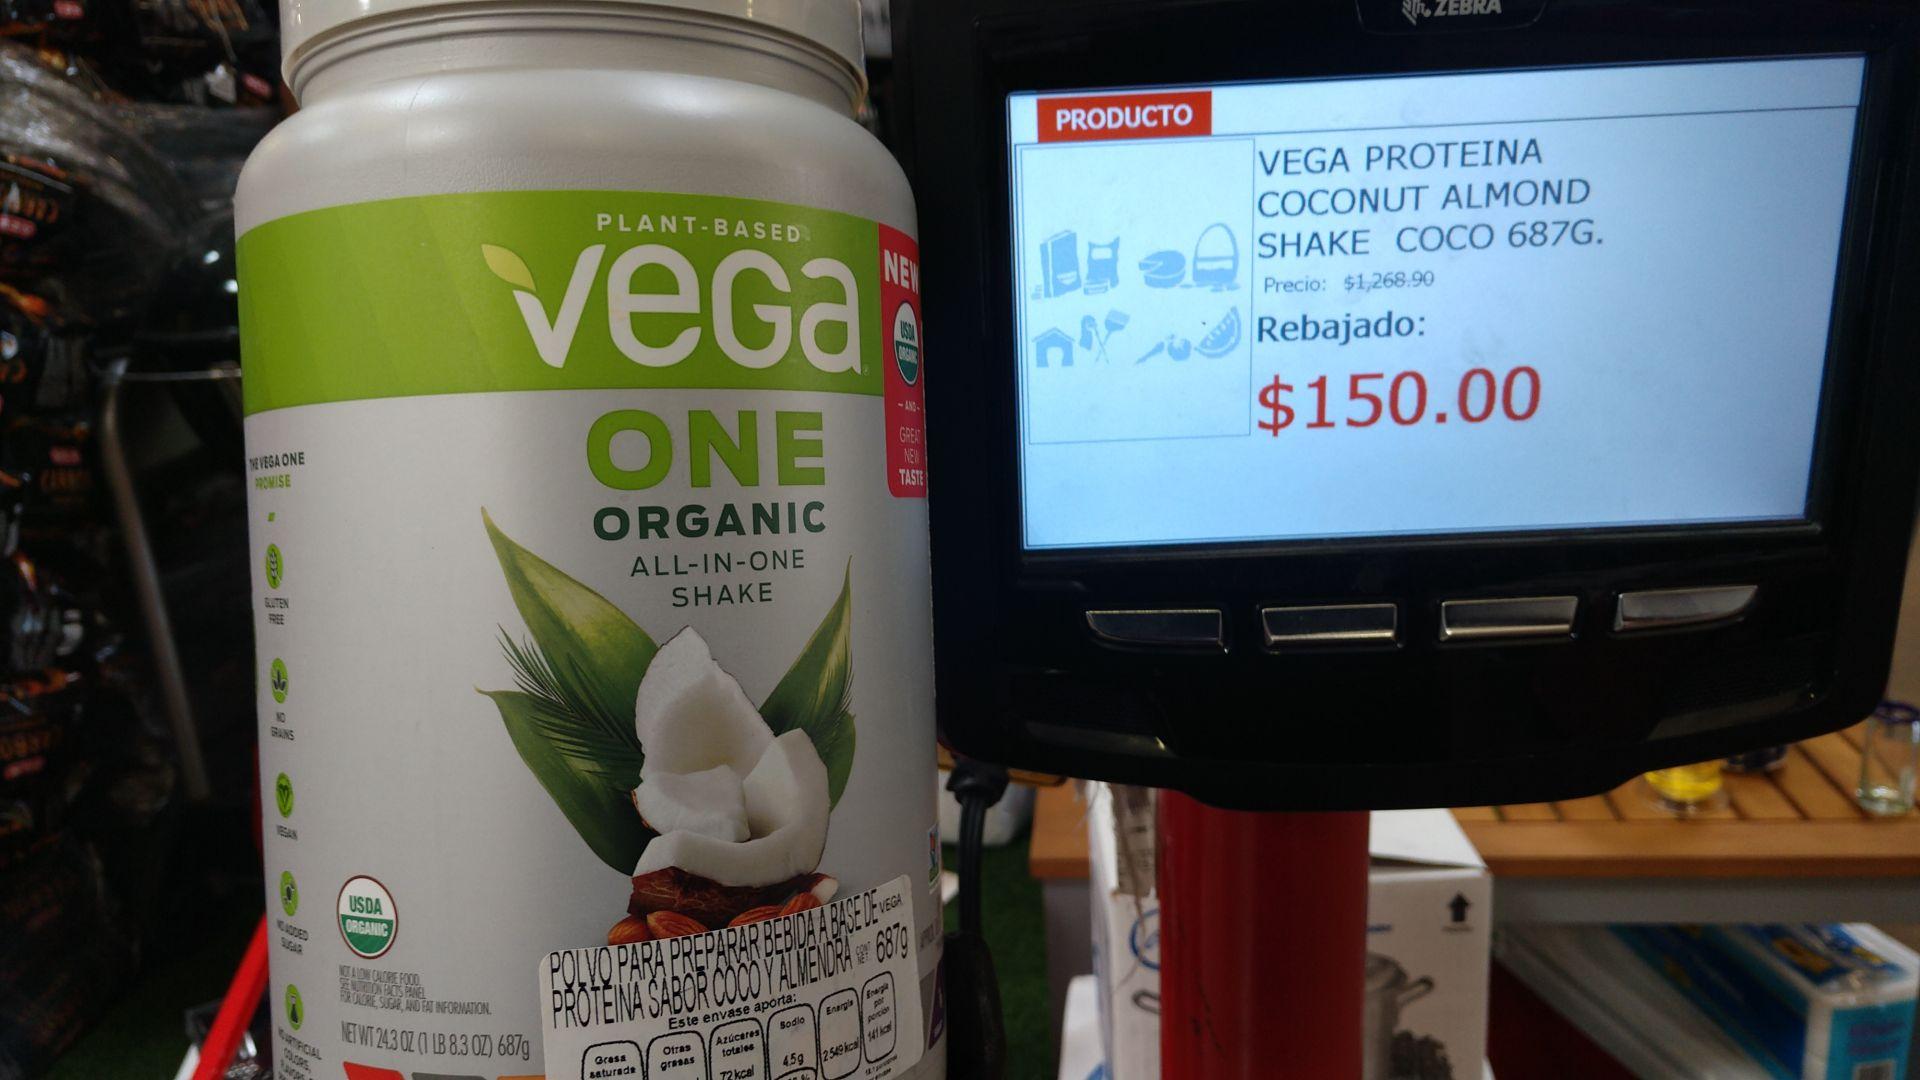 Heb: oferta de proteína vegana